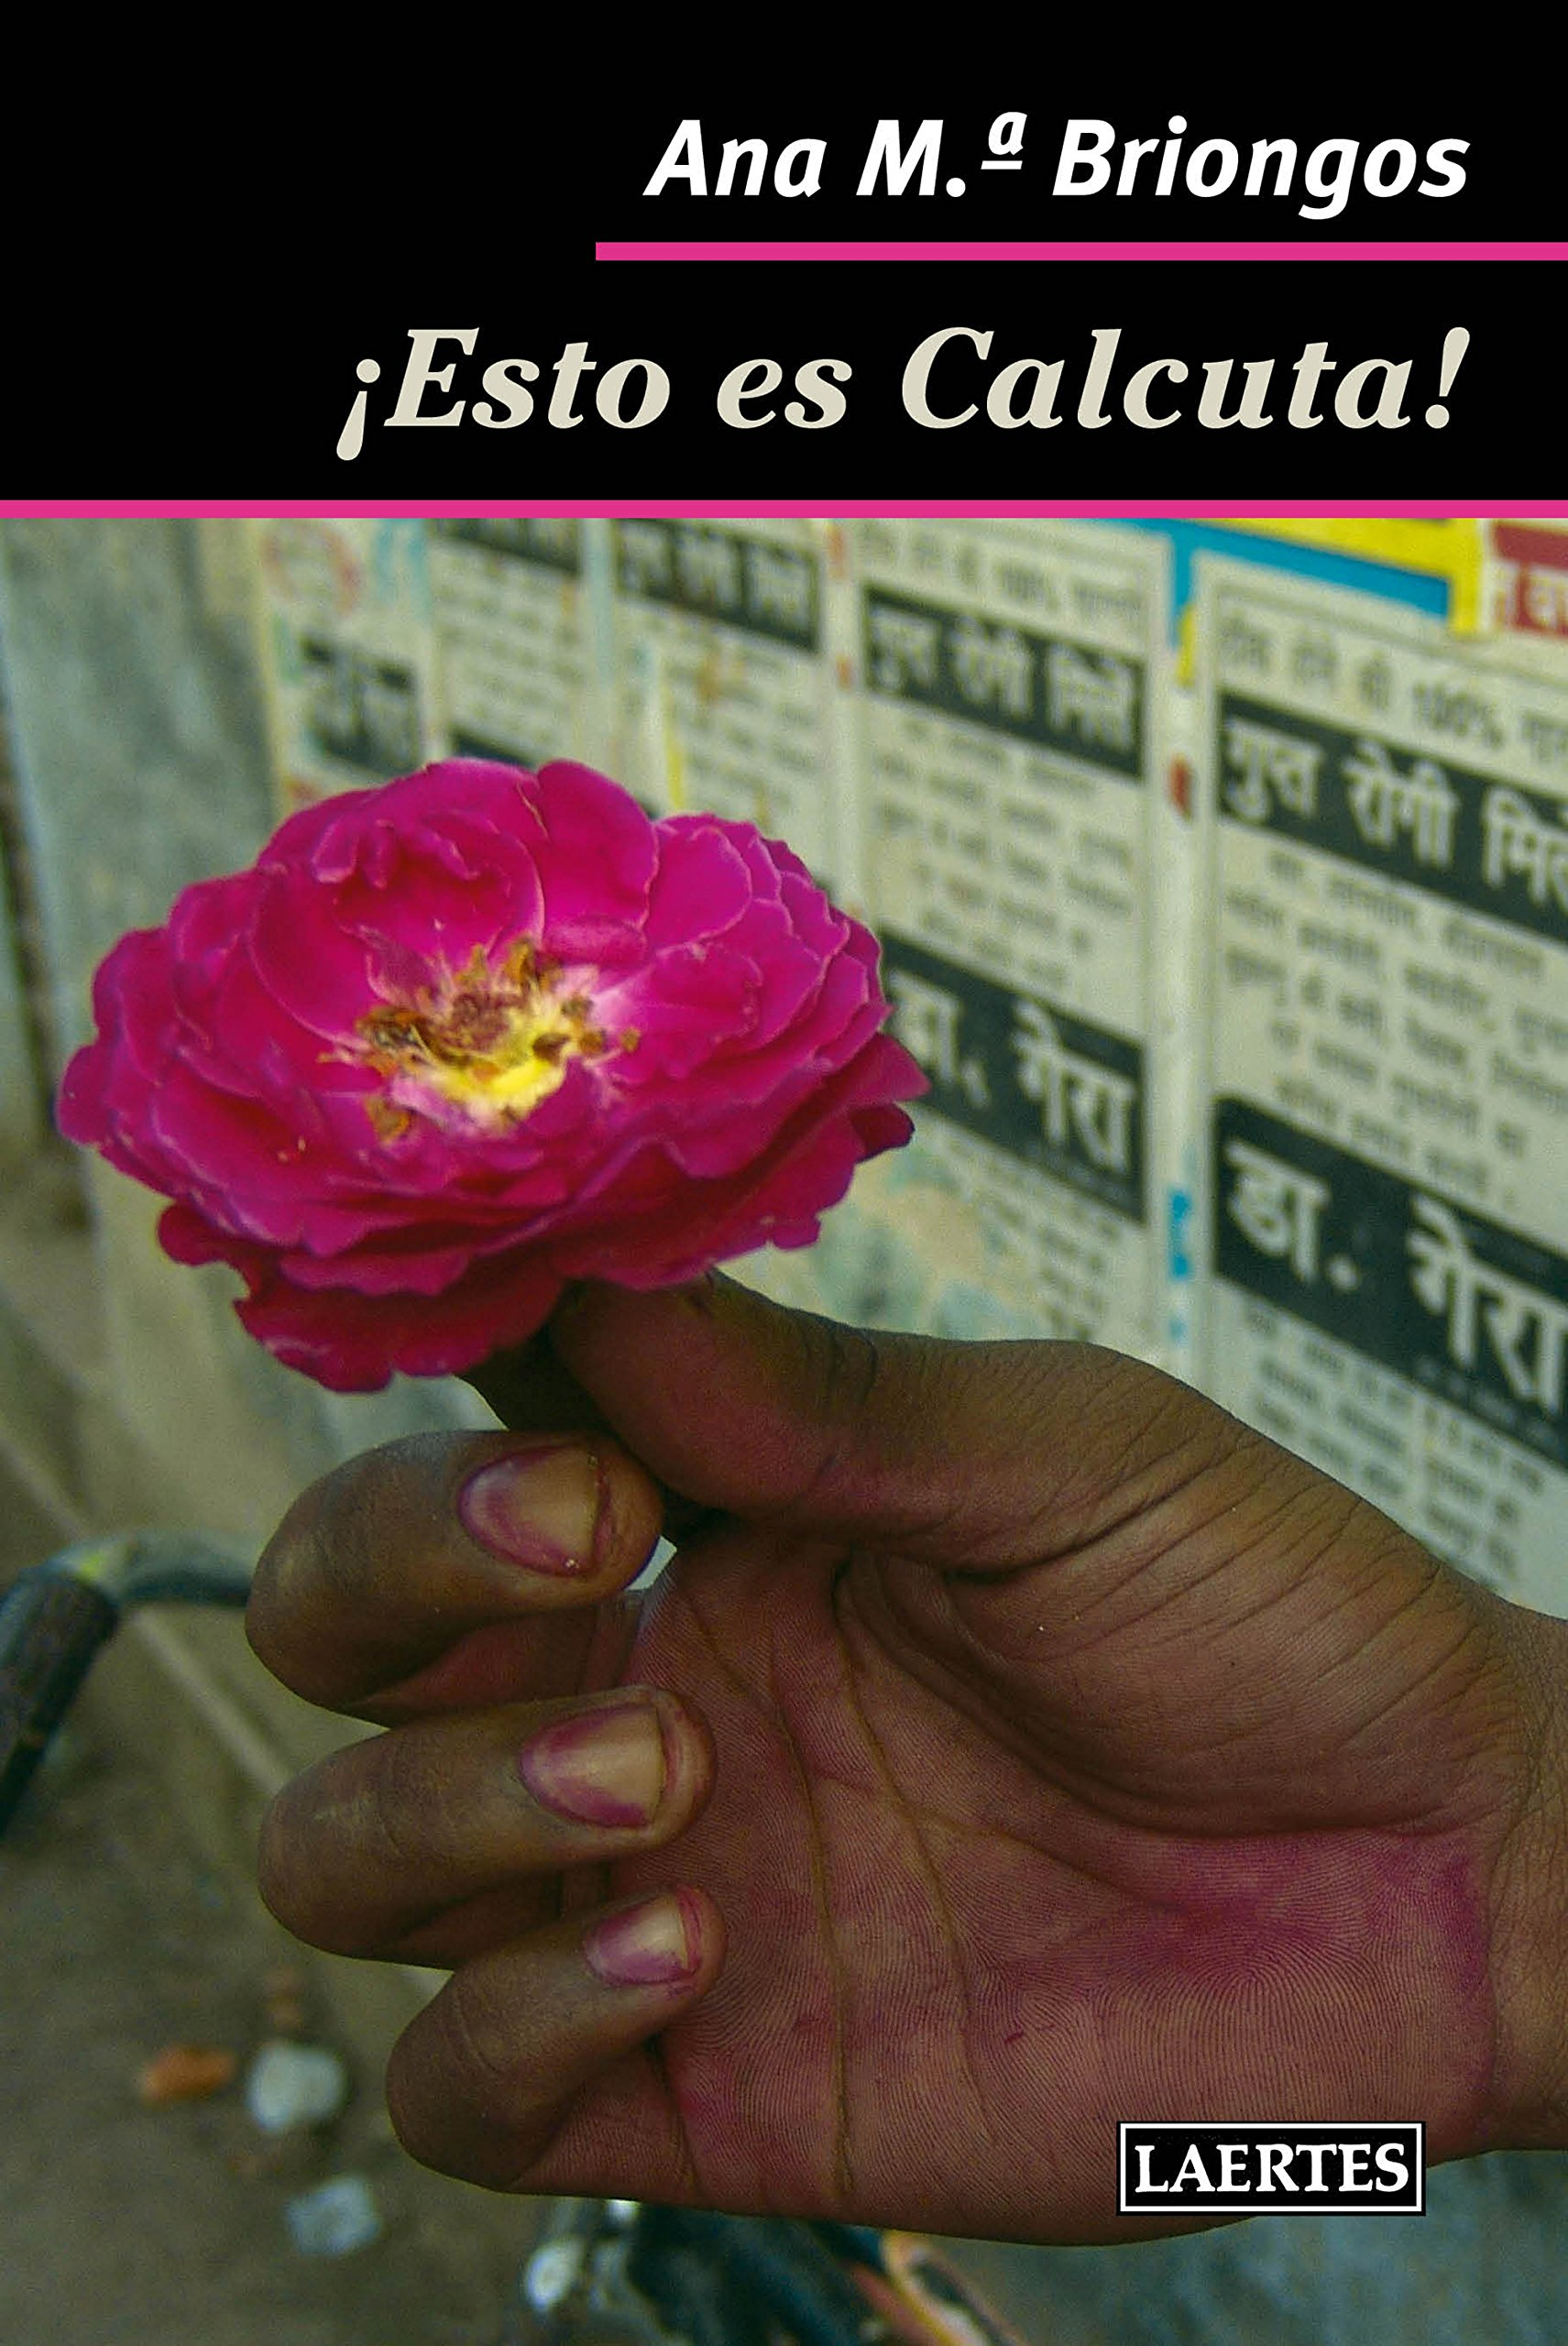 ¡Esto es Calcuta! (Nan Shan) Tapa blanda – 11 dic 2017 Ana María Briongos LAERT|#Laertes 8416783381 India